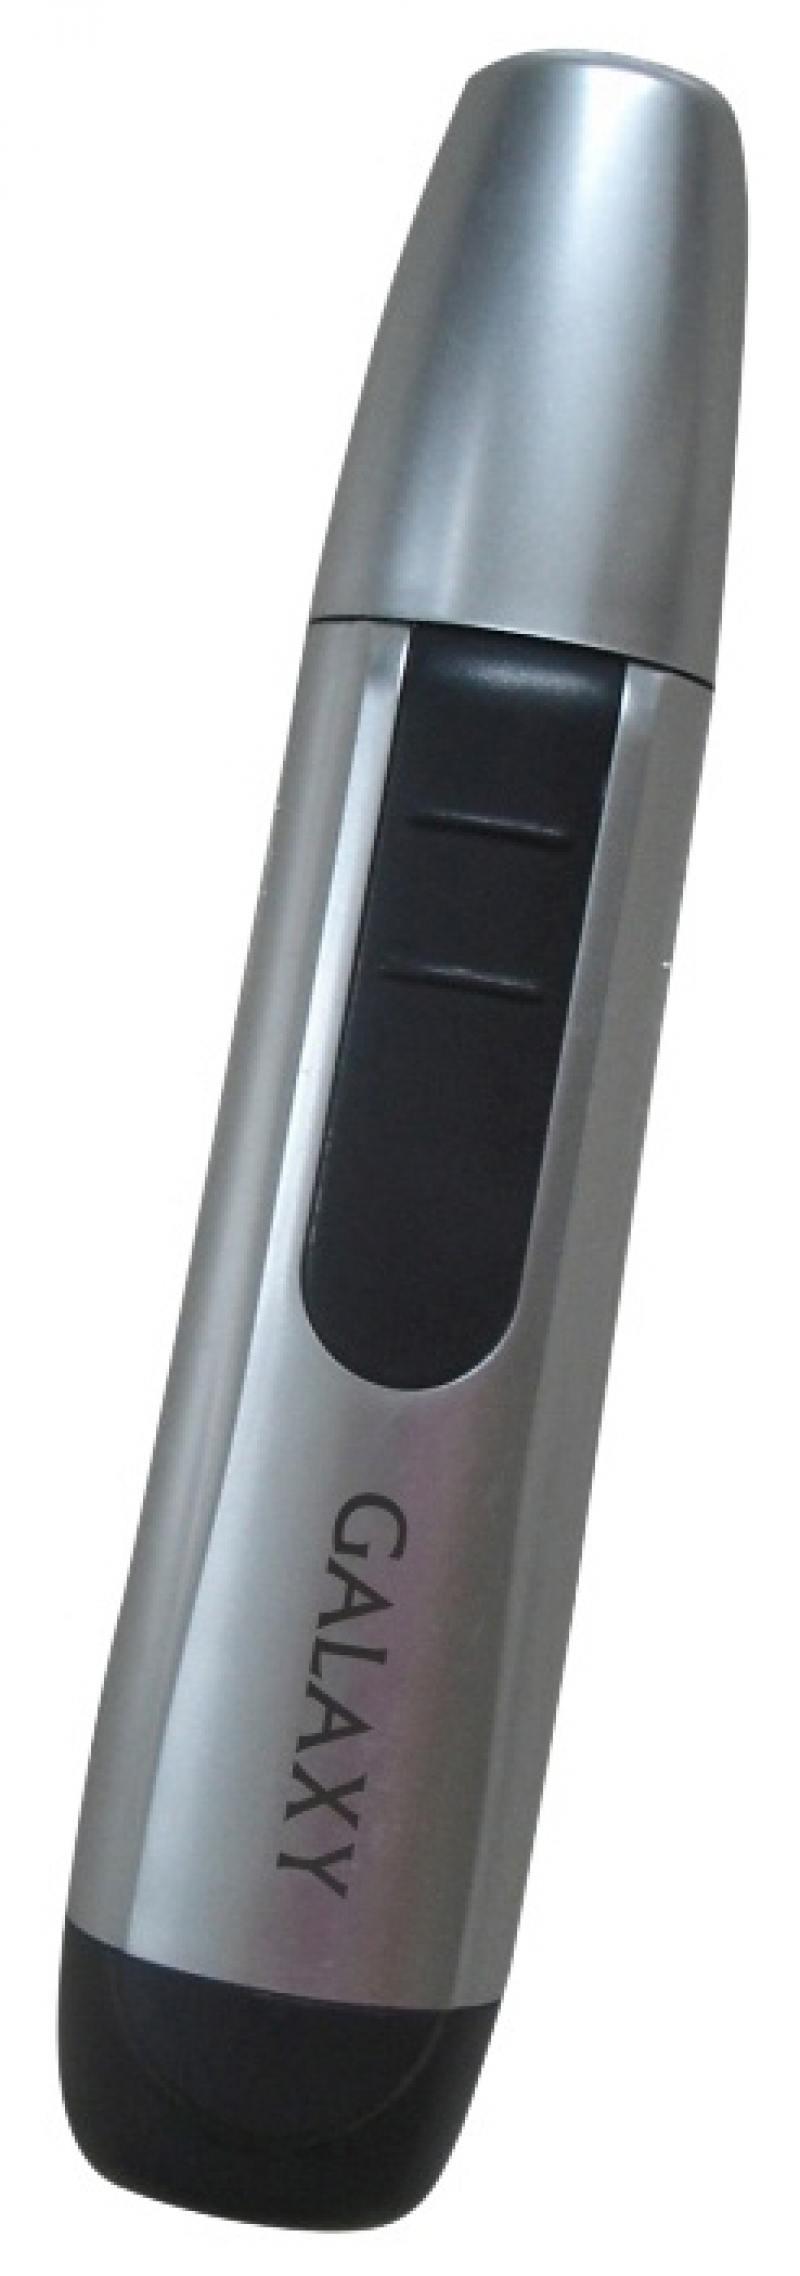 Триммер GALAXY GL4230 серебристый